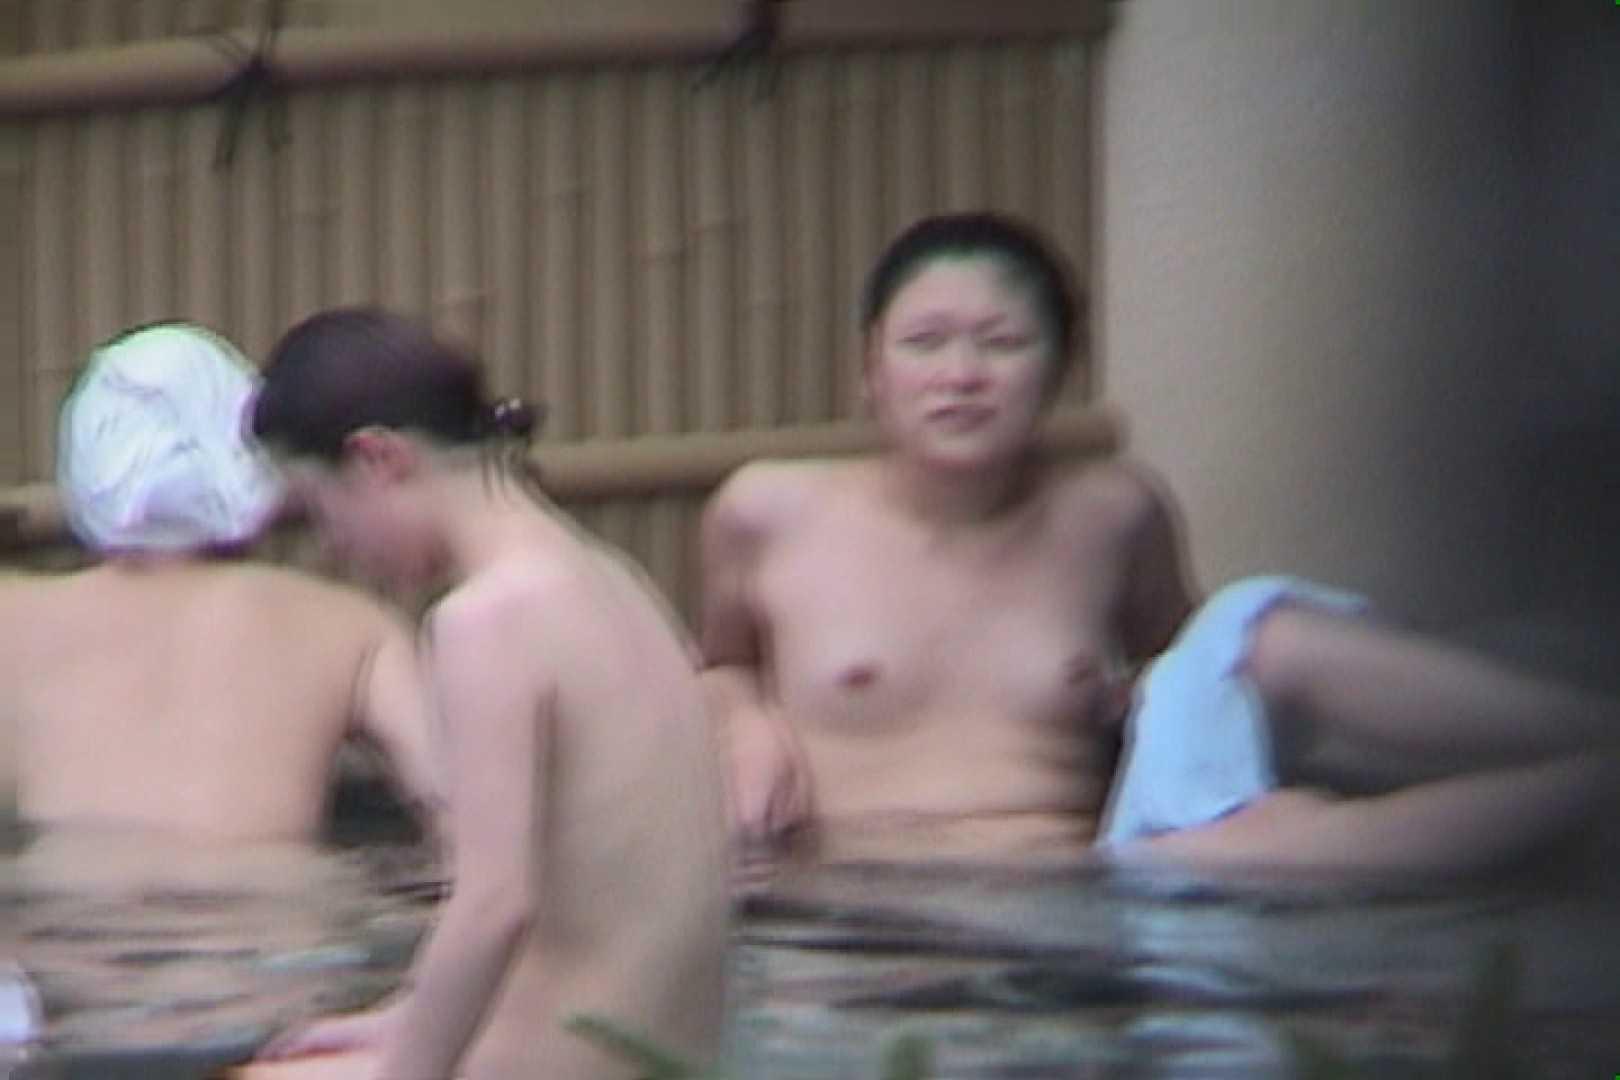 Aquaな露天風呂Vol.601 HなOL 戯れ無修正画像 99pic 47